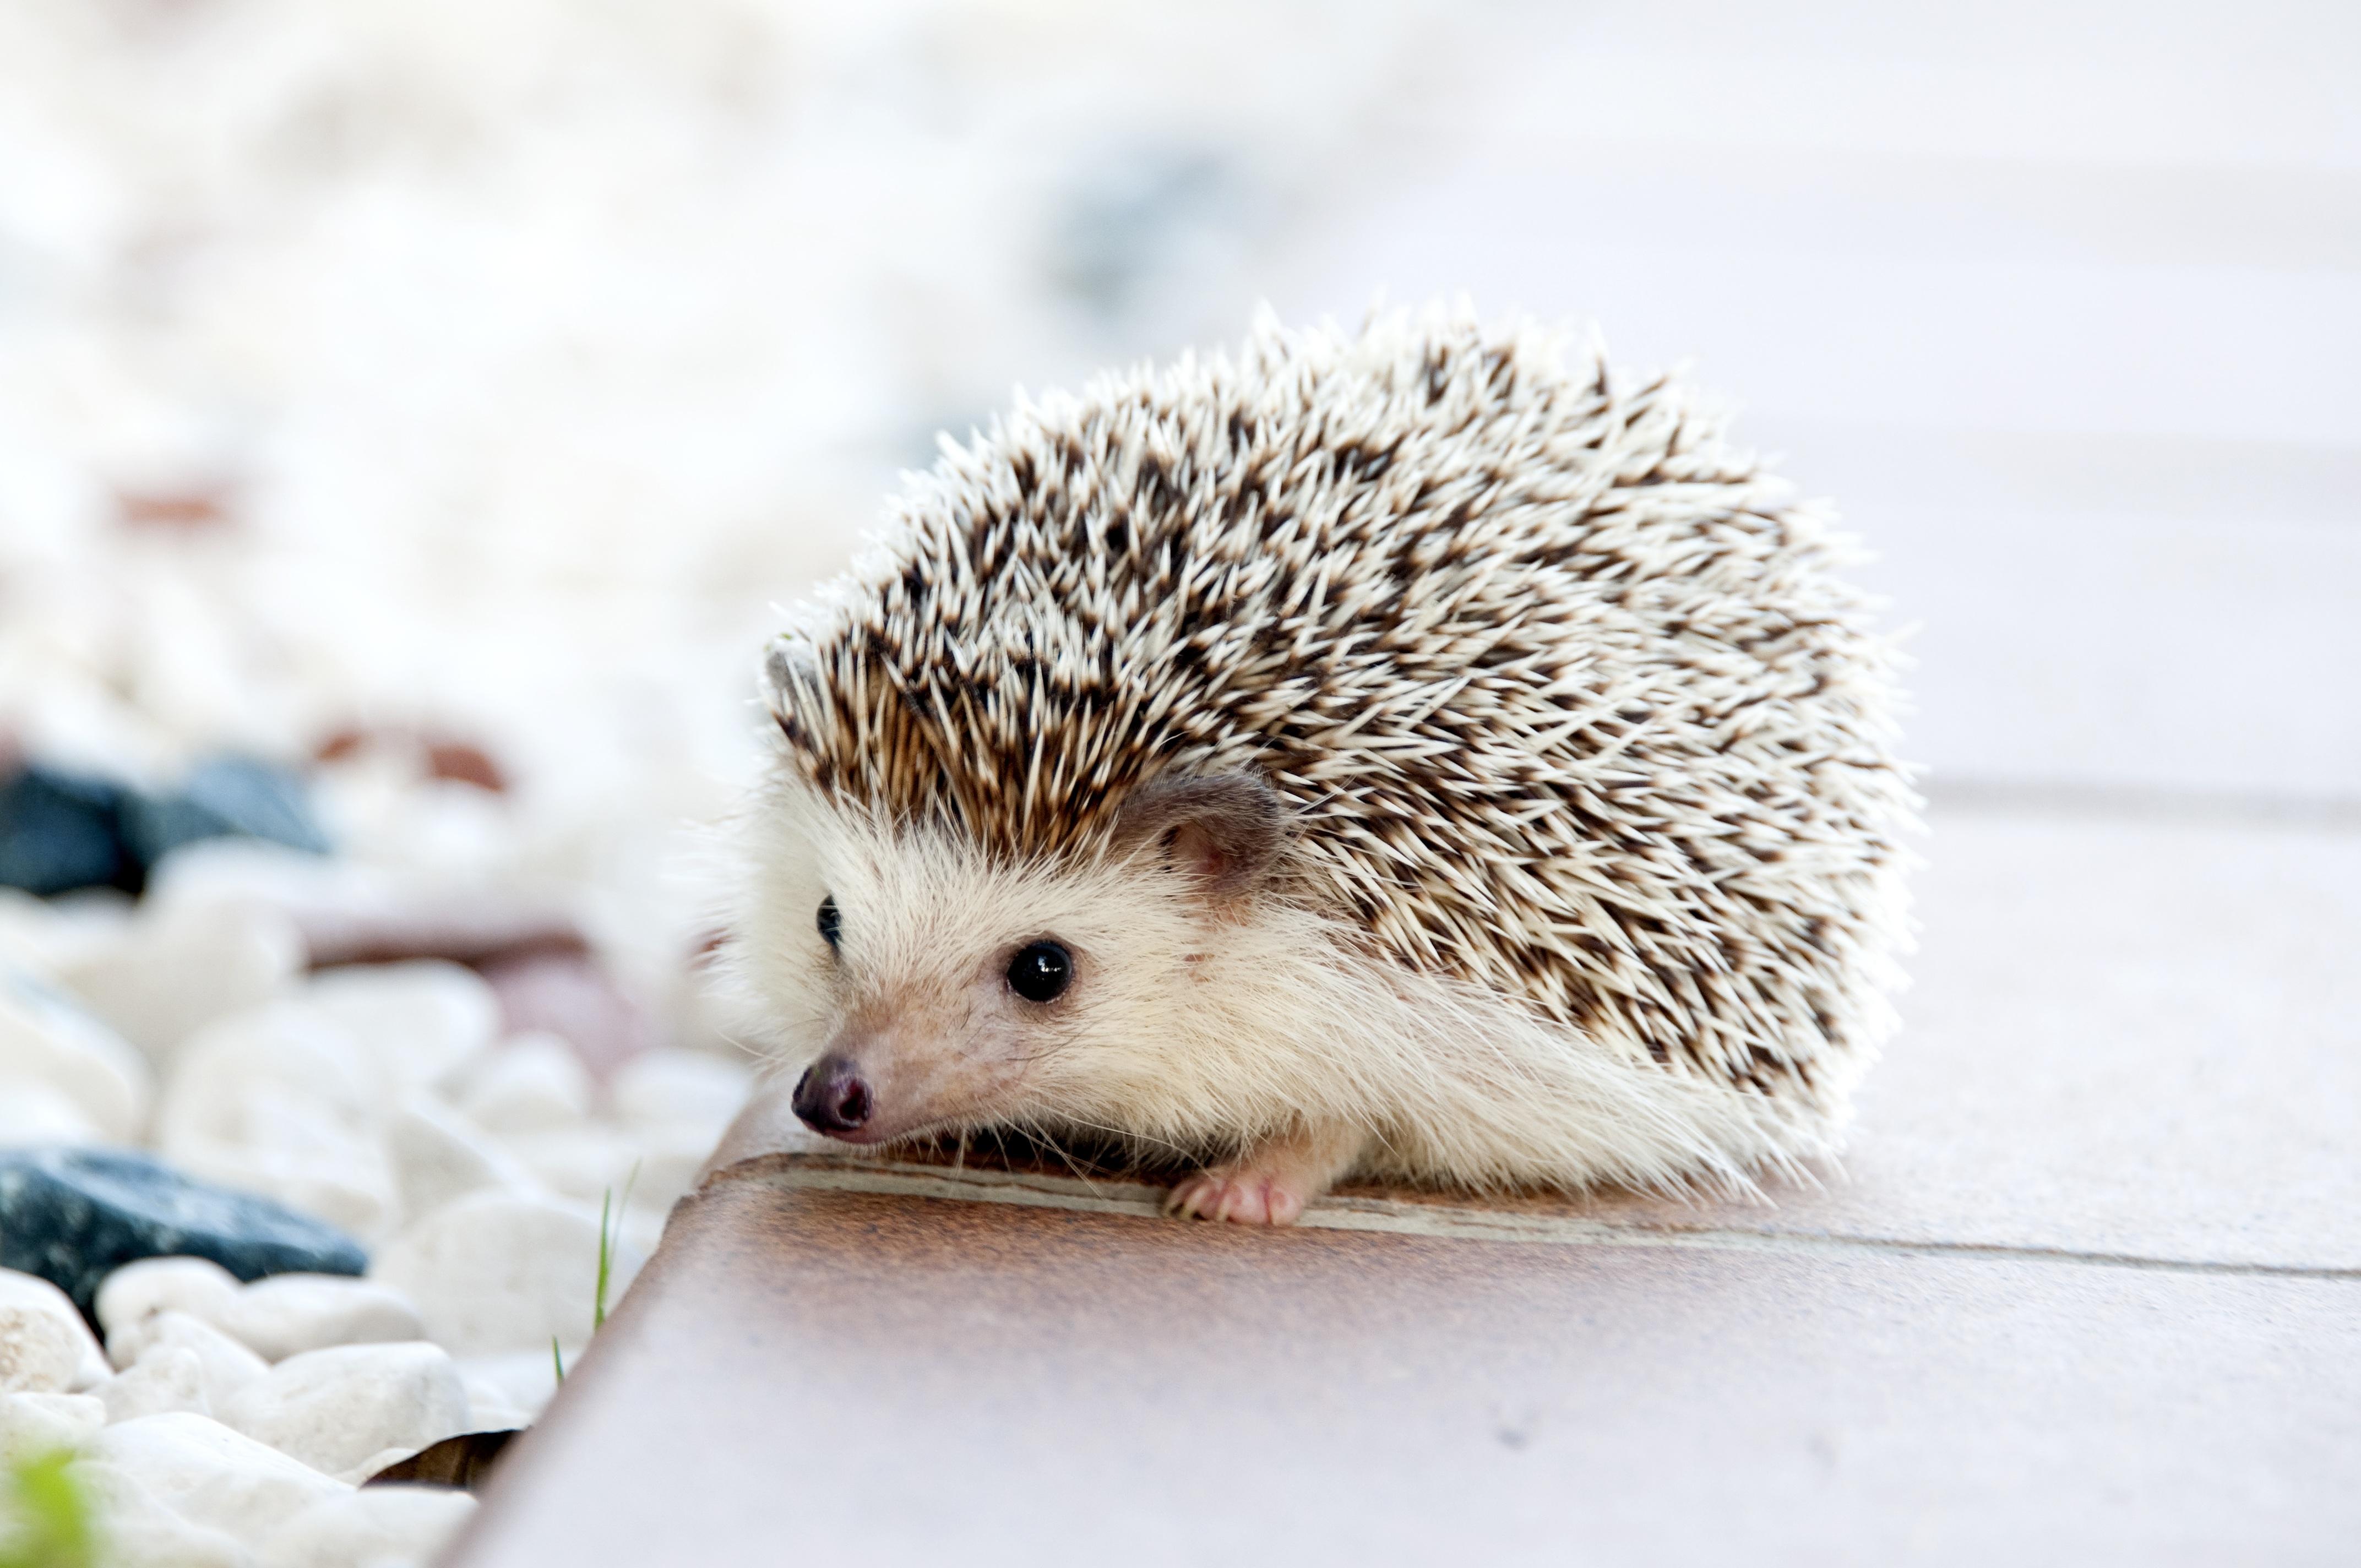 1000 Great Cute Animals Photos Pexels Free Stock Photos